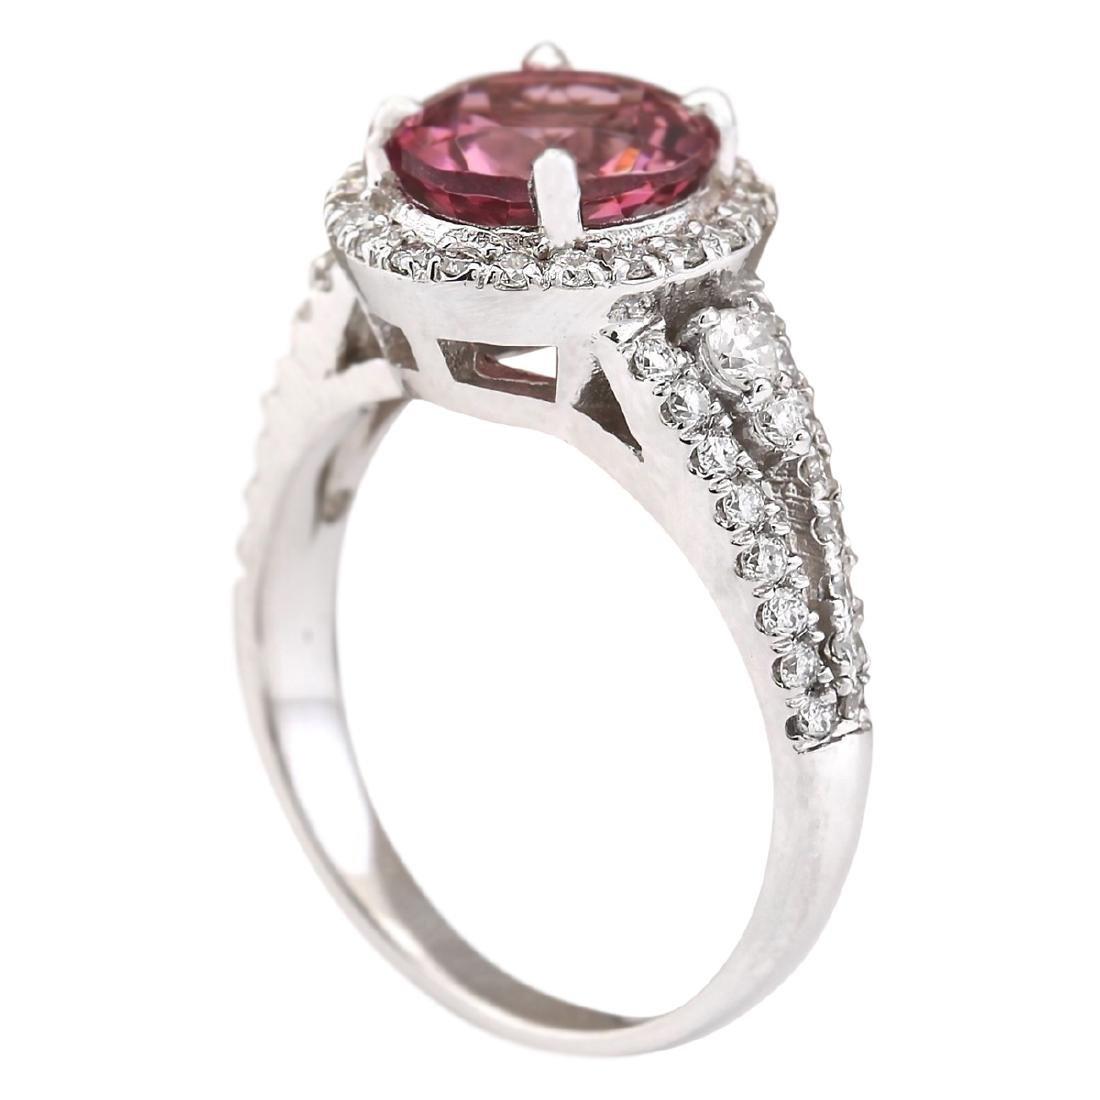 2.79 CTW Natural Pink Tourmaline And Diamond Ring 18K - 3